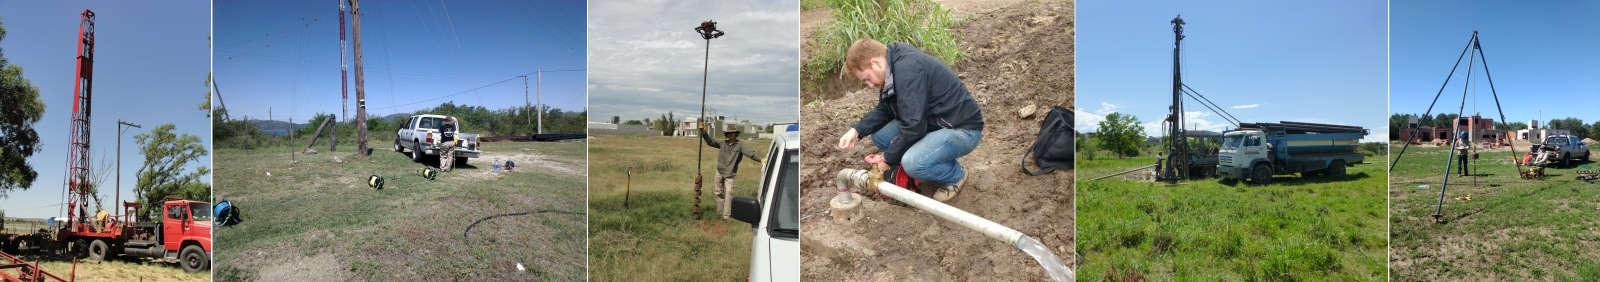 servicios geológicos córdoba - geoestudios